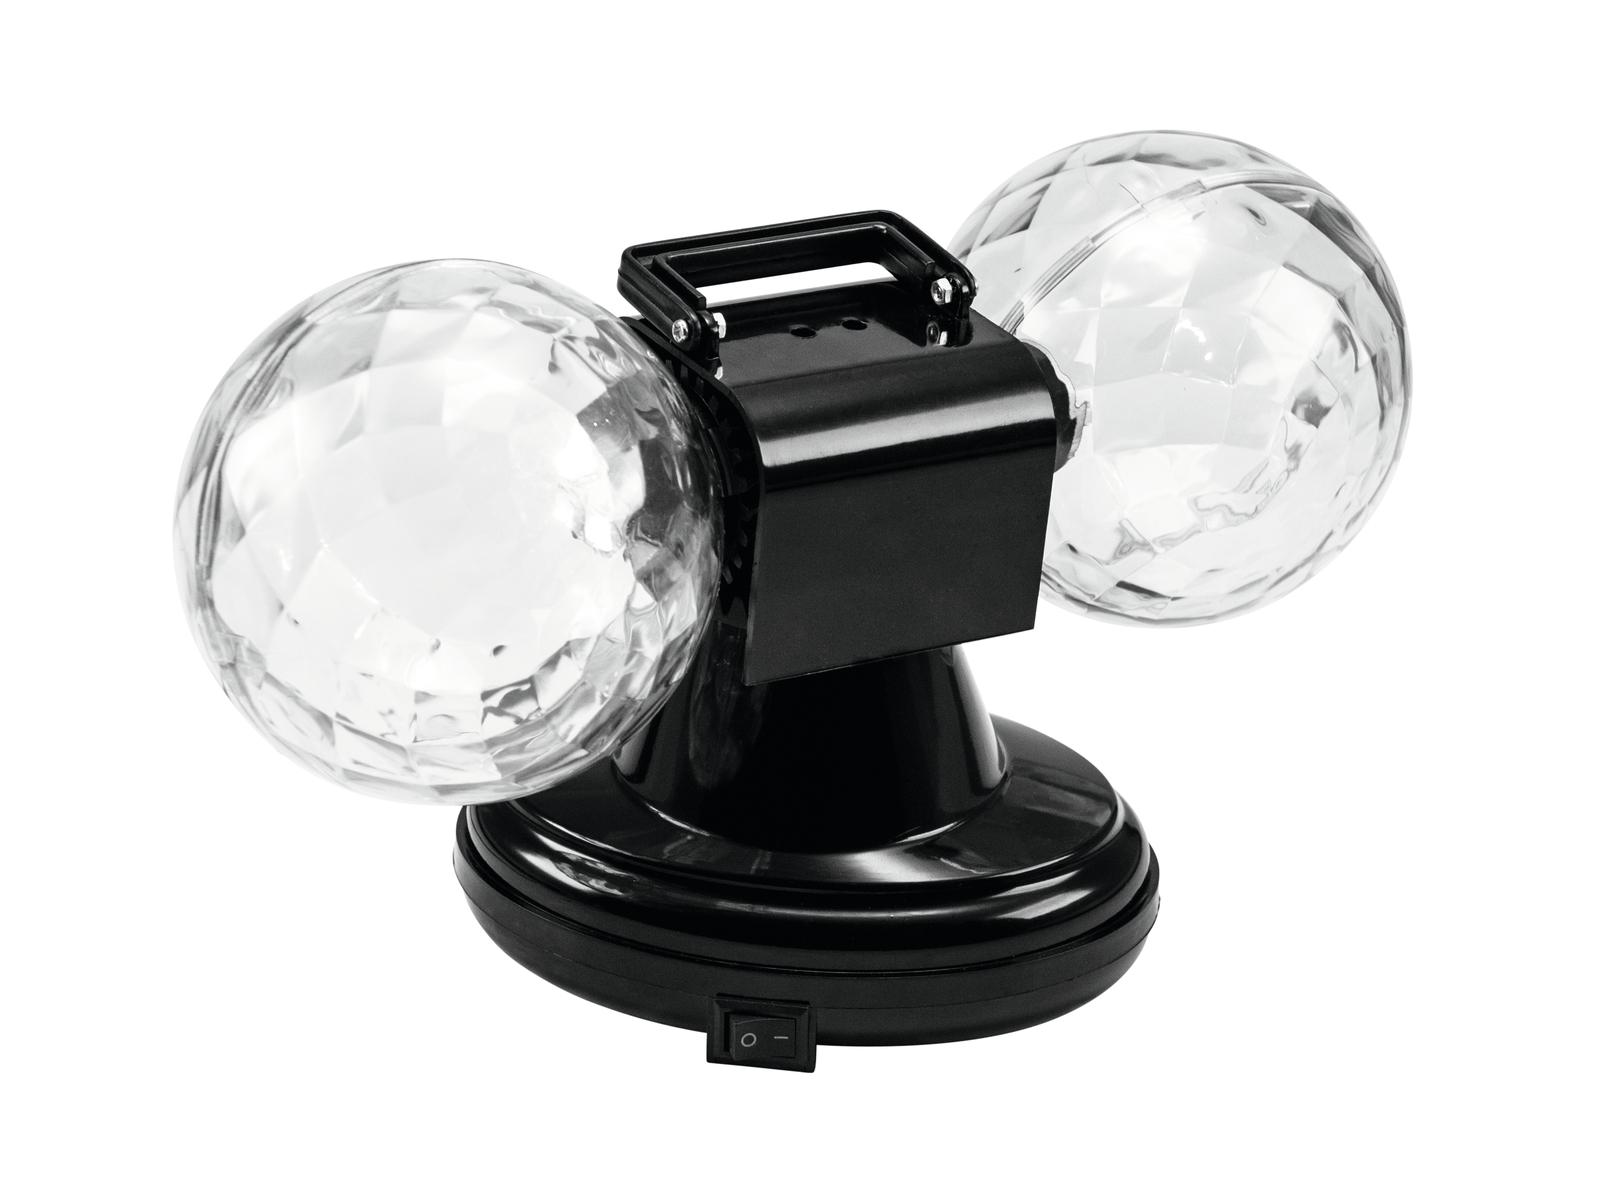 EUROLITE LED MDB-12 Mini double ball